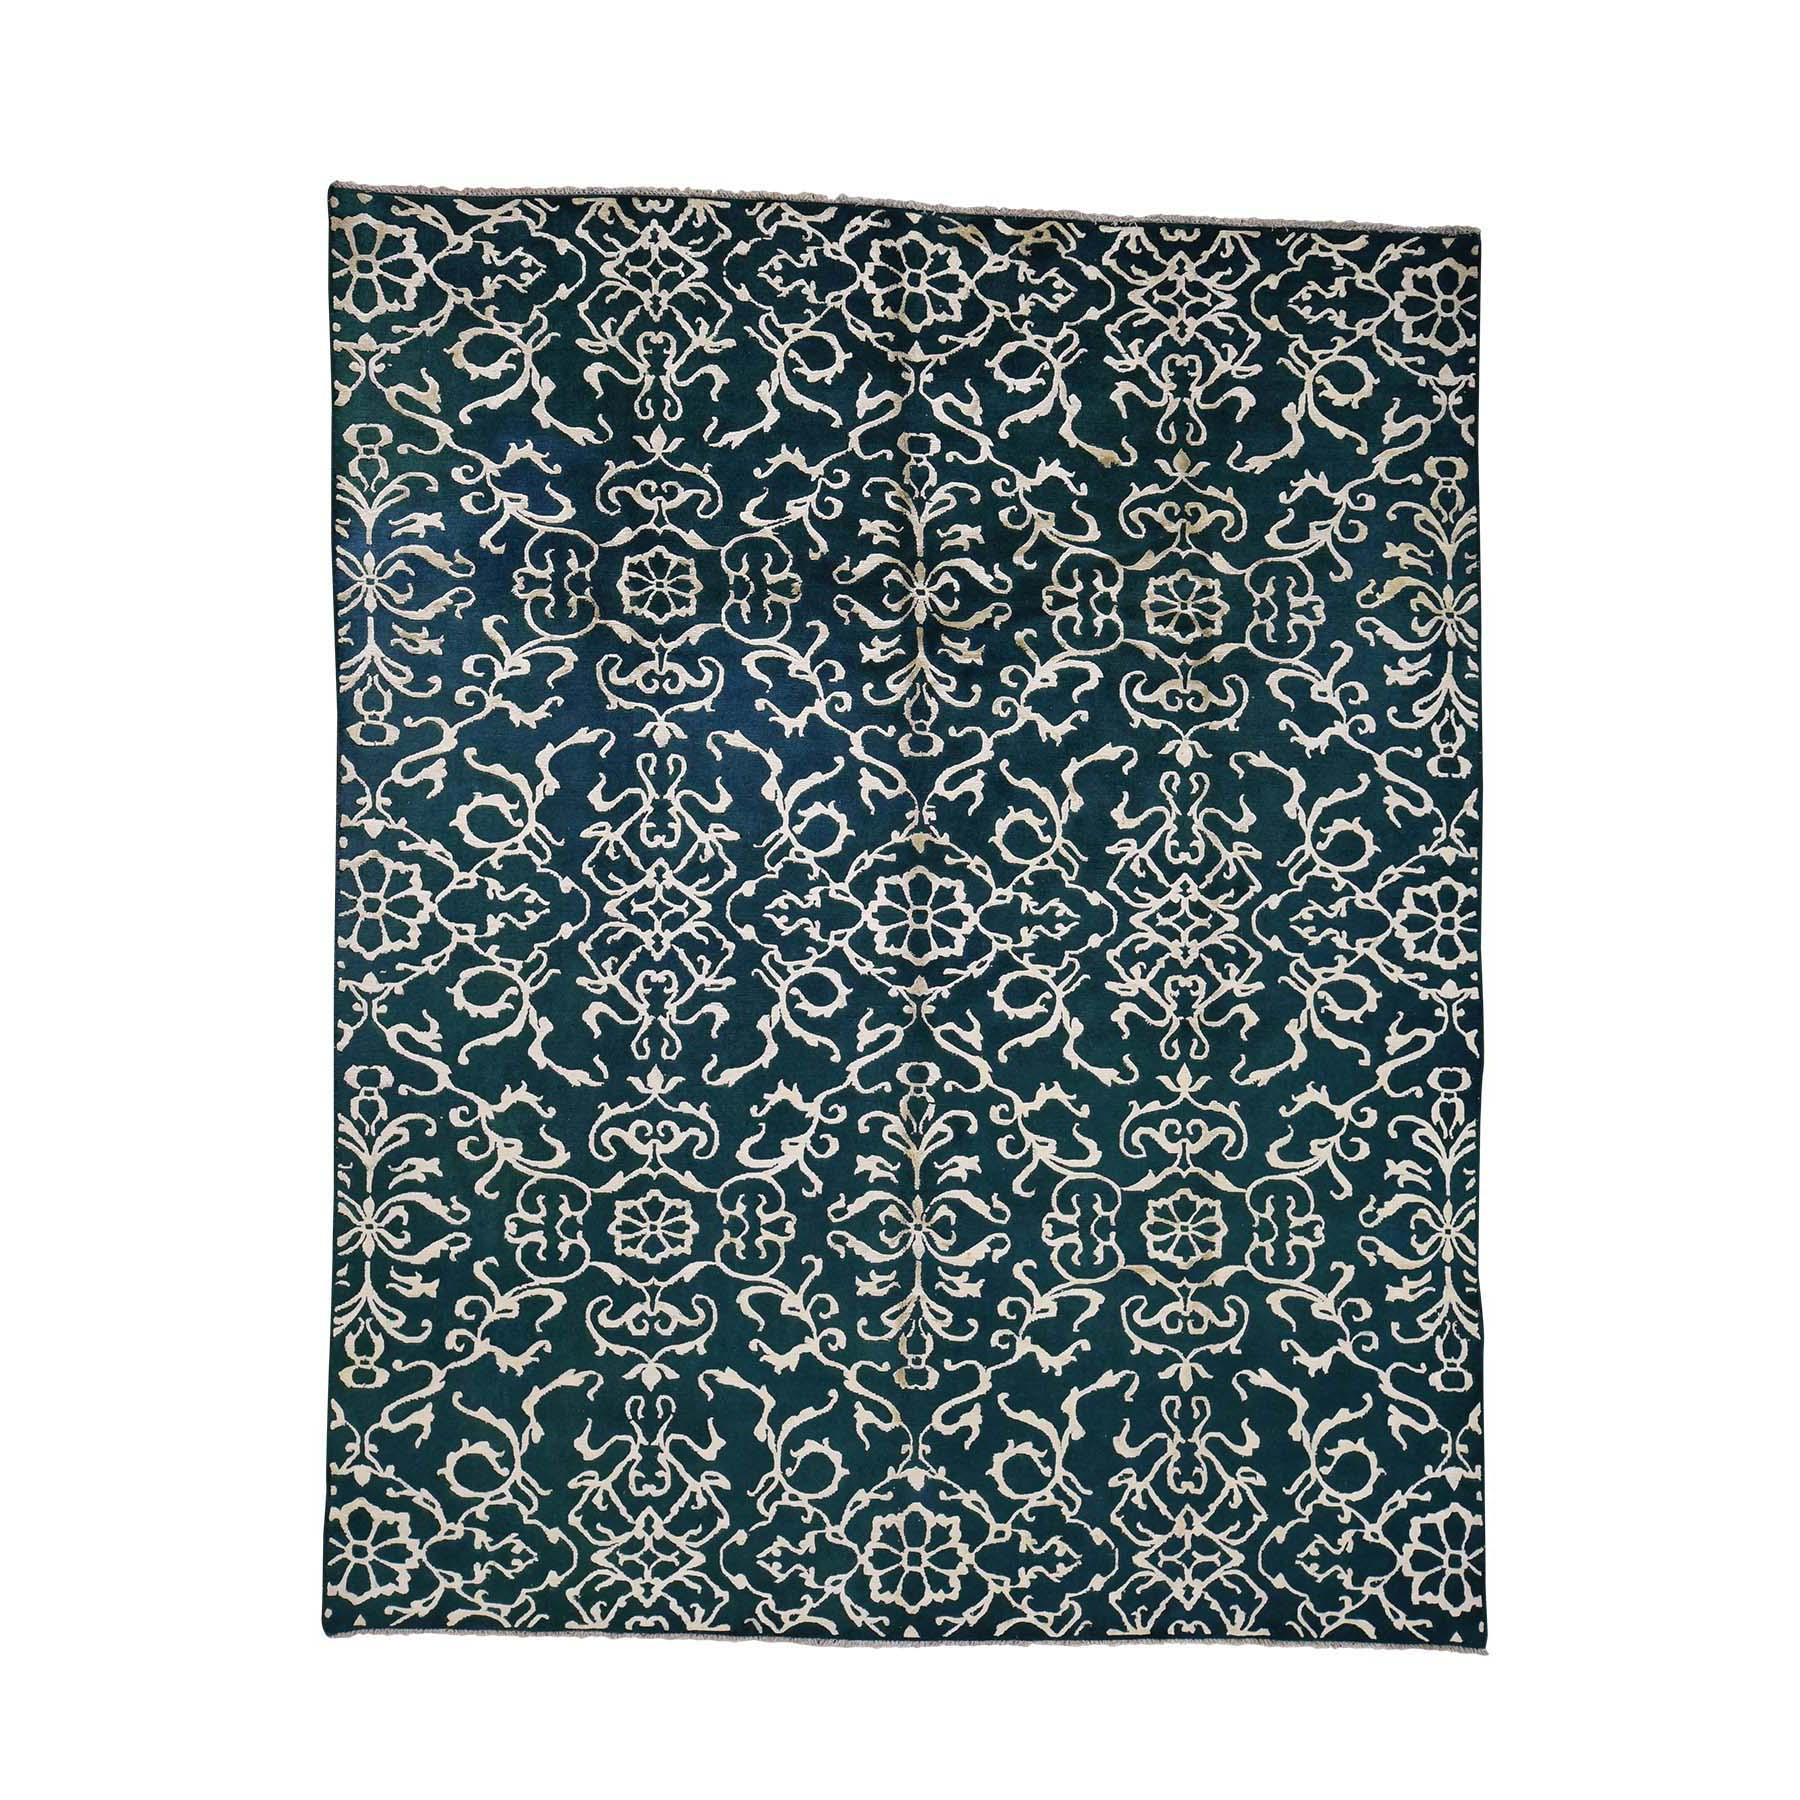 7'7''X9'4'' Wool And Silk Modern Nepali Hand Knotted Oriental Rug moac90da